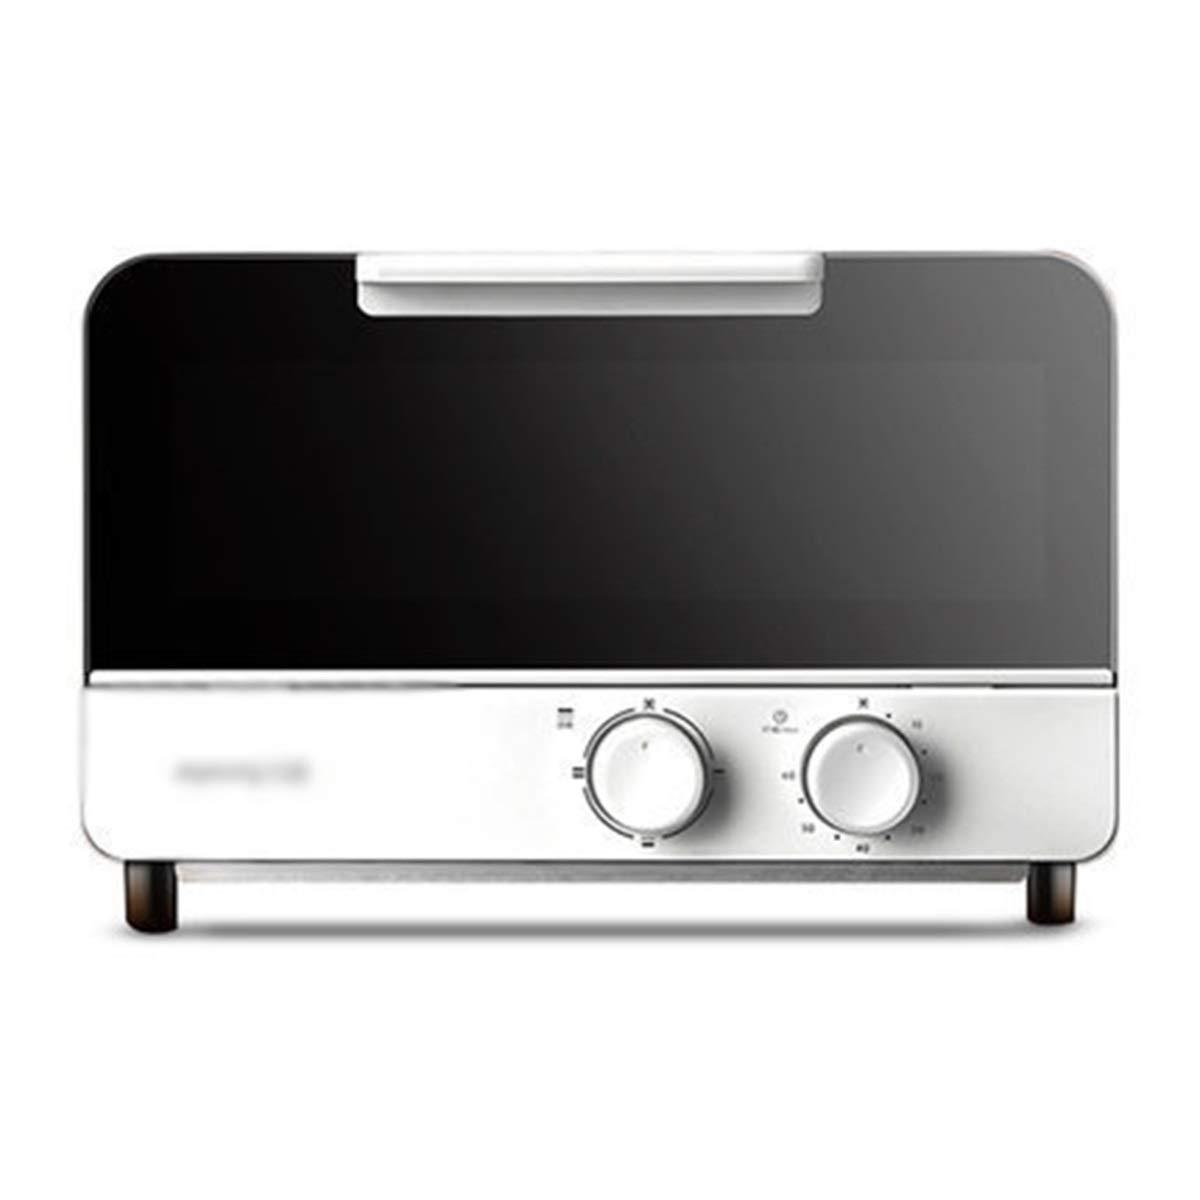 THOR-YAN ミニオーブン - 電気オーブン家庭用ミニオーブンベーキング多機能自動オーブンケーキ小型オーブン -46 オーブン   B07NWYNXFN